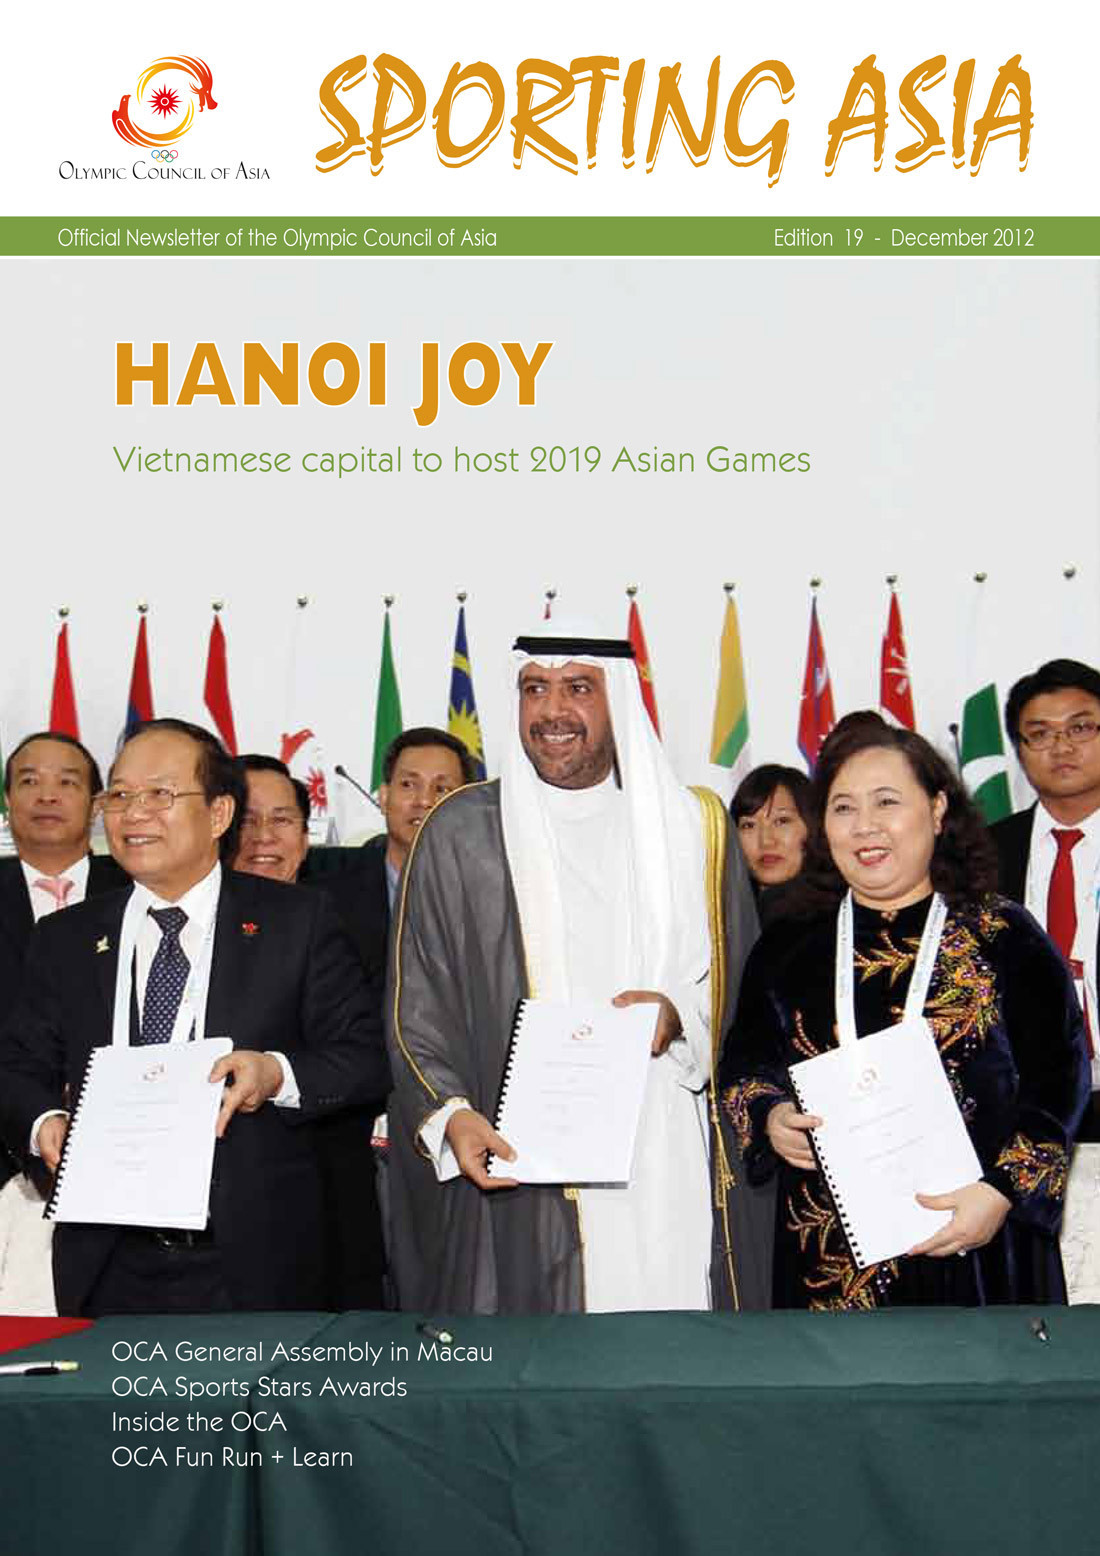 Sporting Asia - Edition 19 - DEC 2012